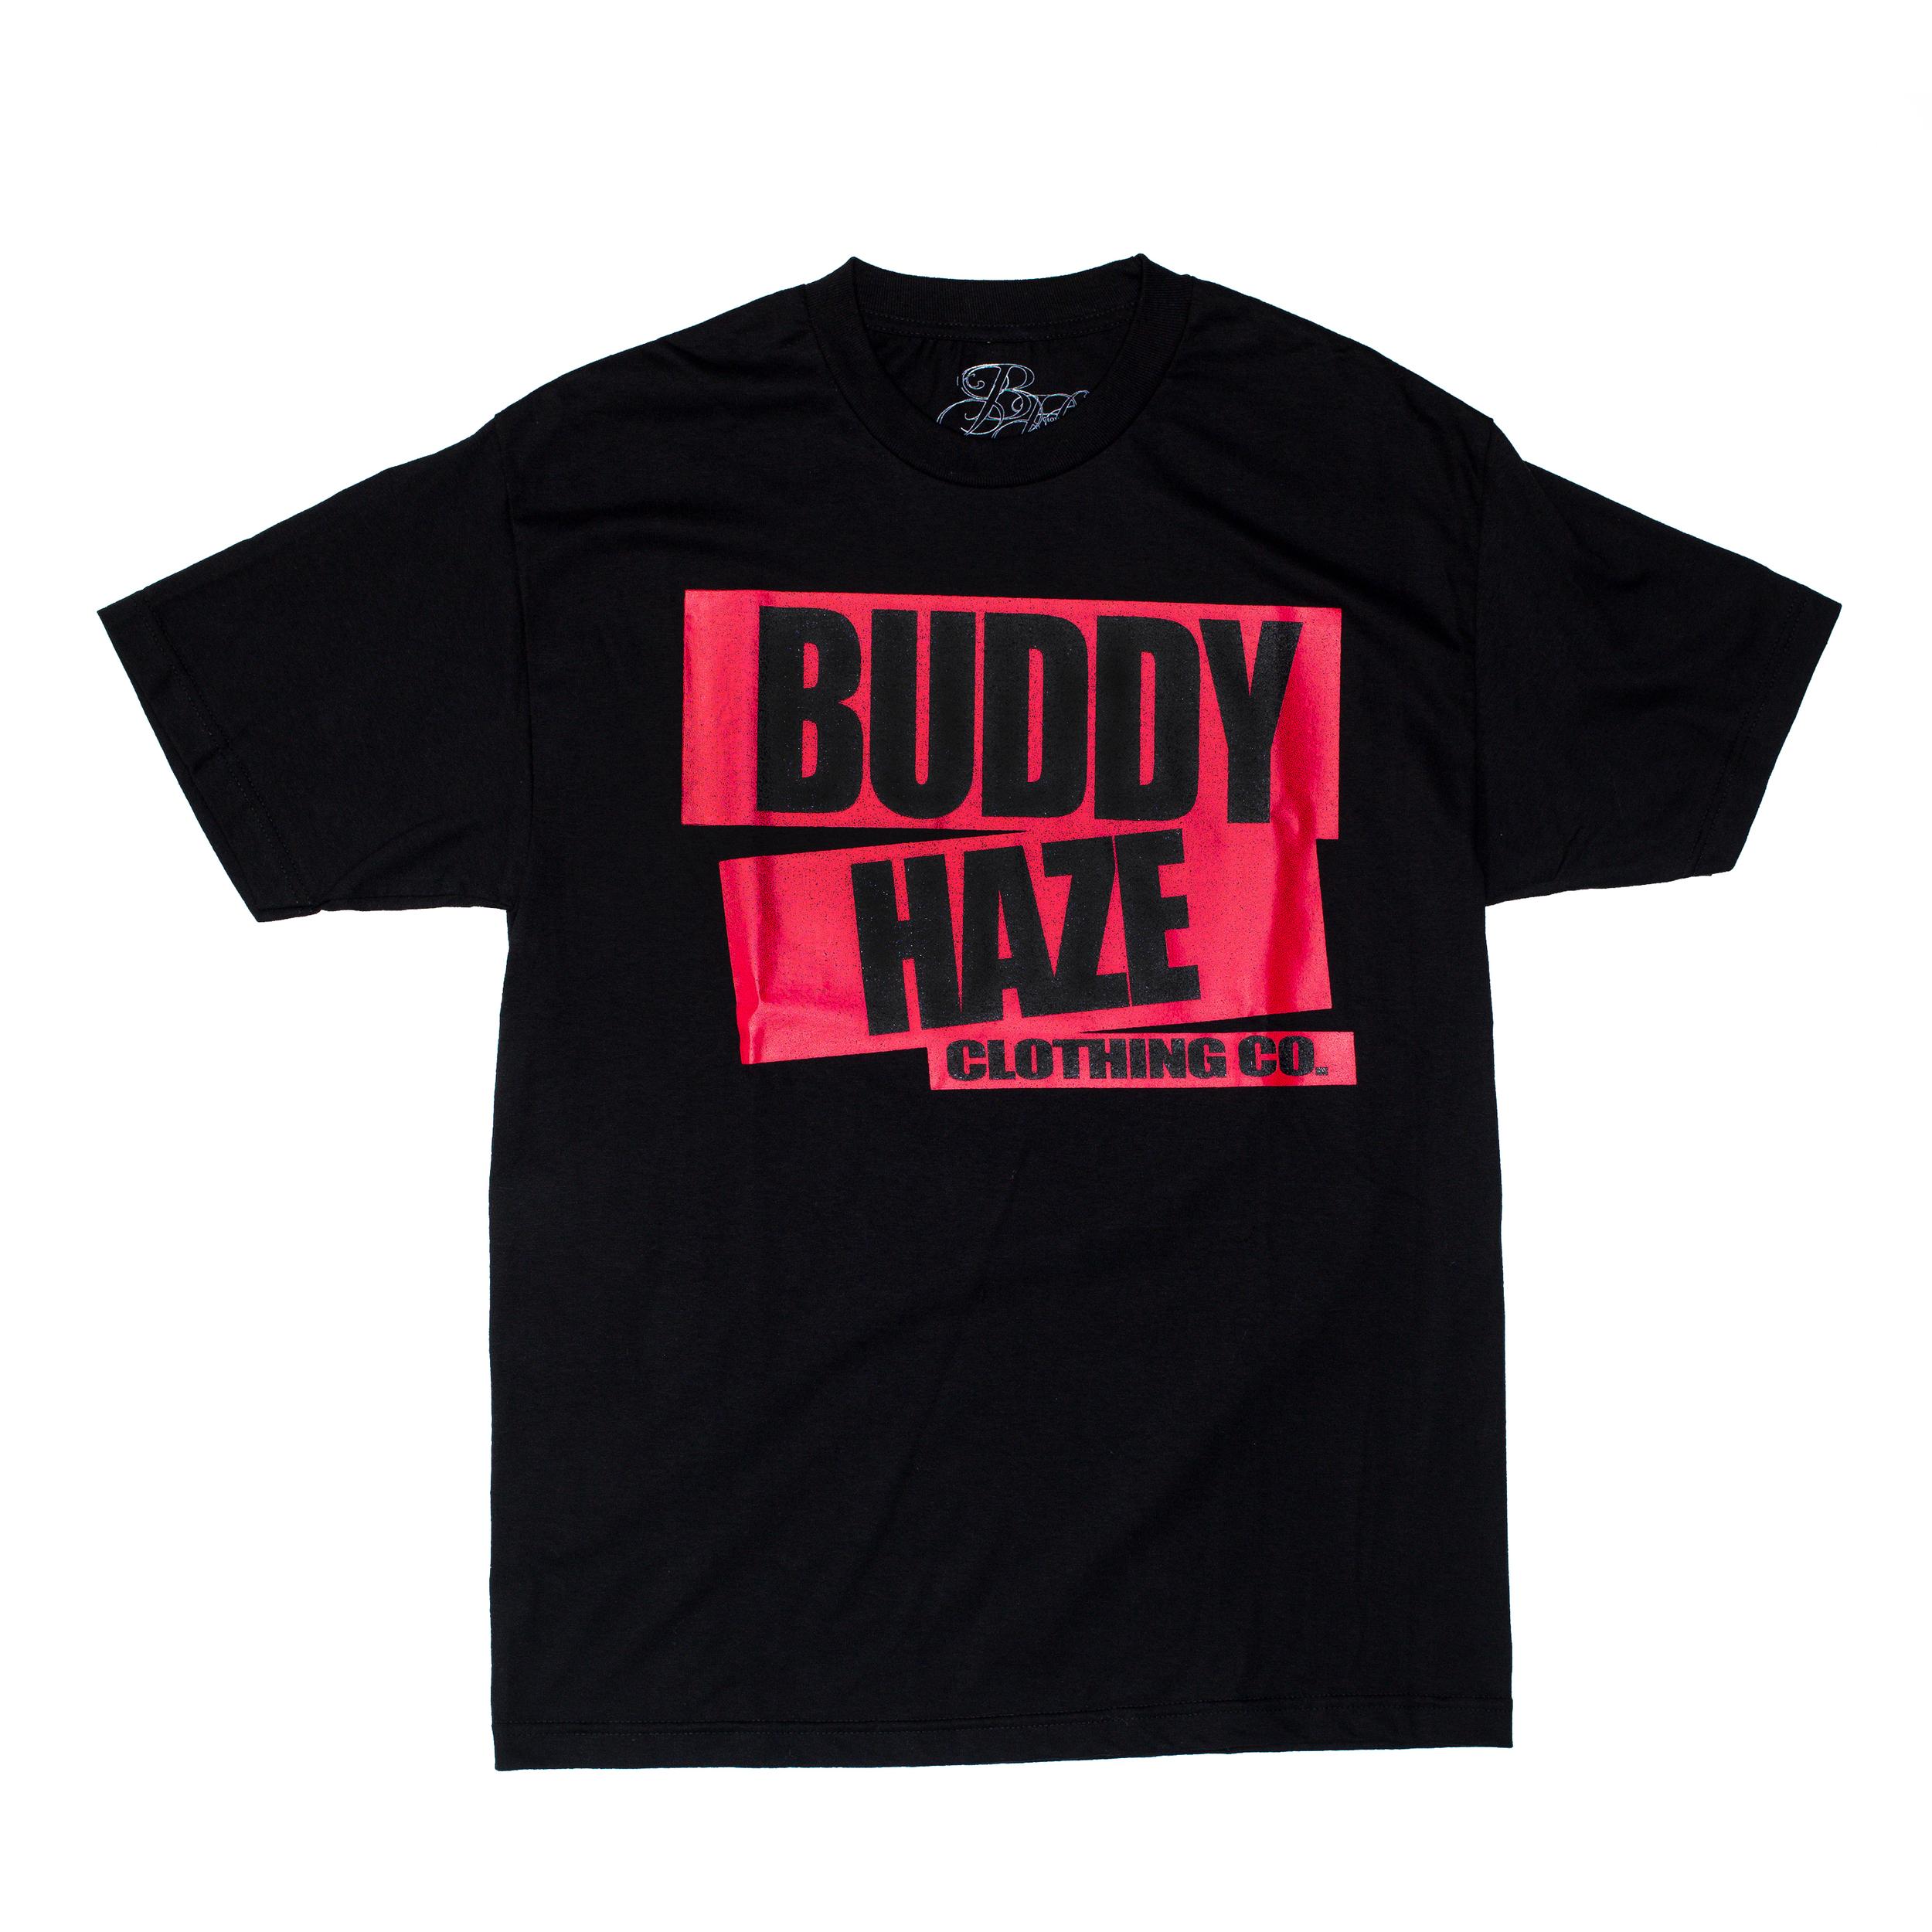 BUDDY_HAZE_SHOTS5.jpg